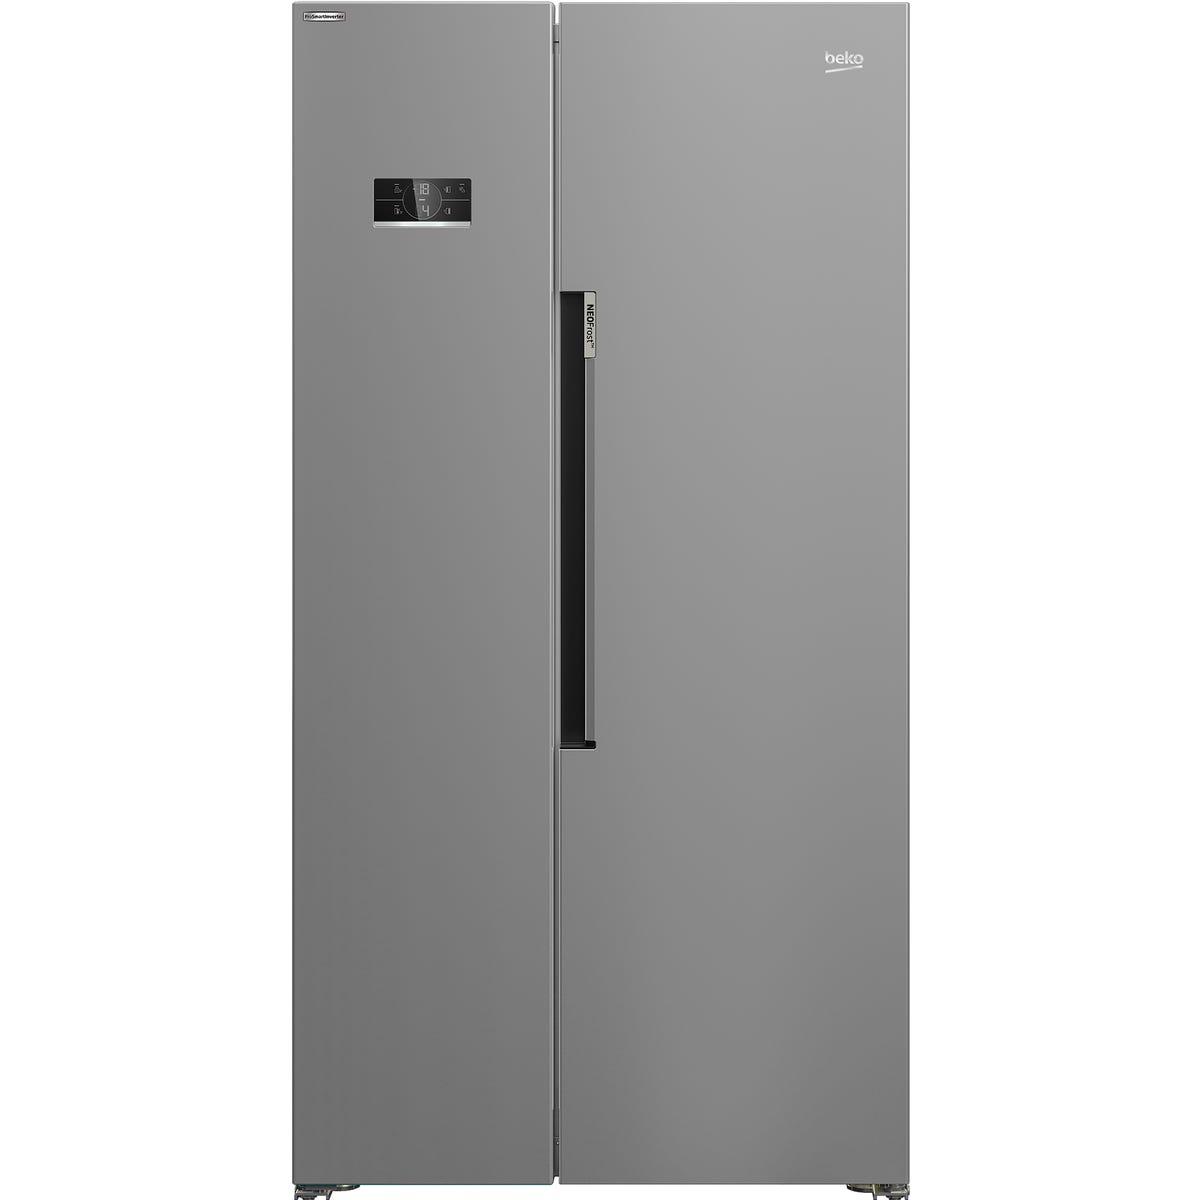 Beko ASL1342S American Style Frost Free 368L/212L Fridge Freezer - Silver